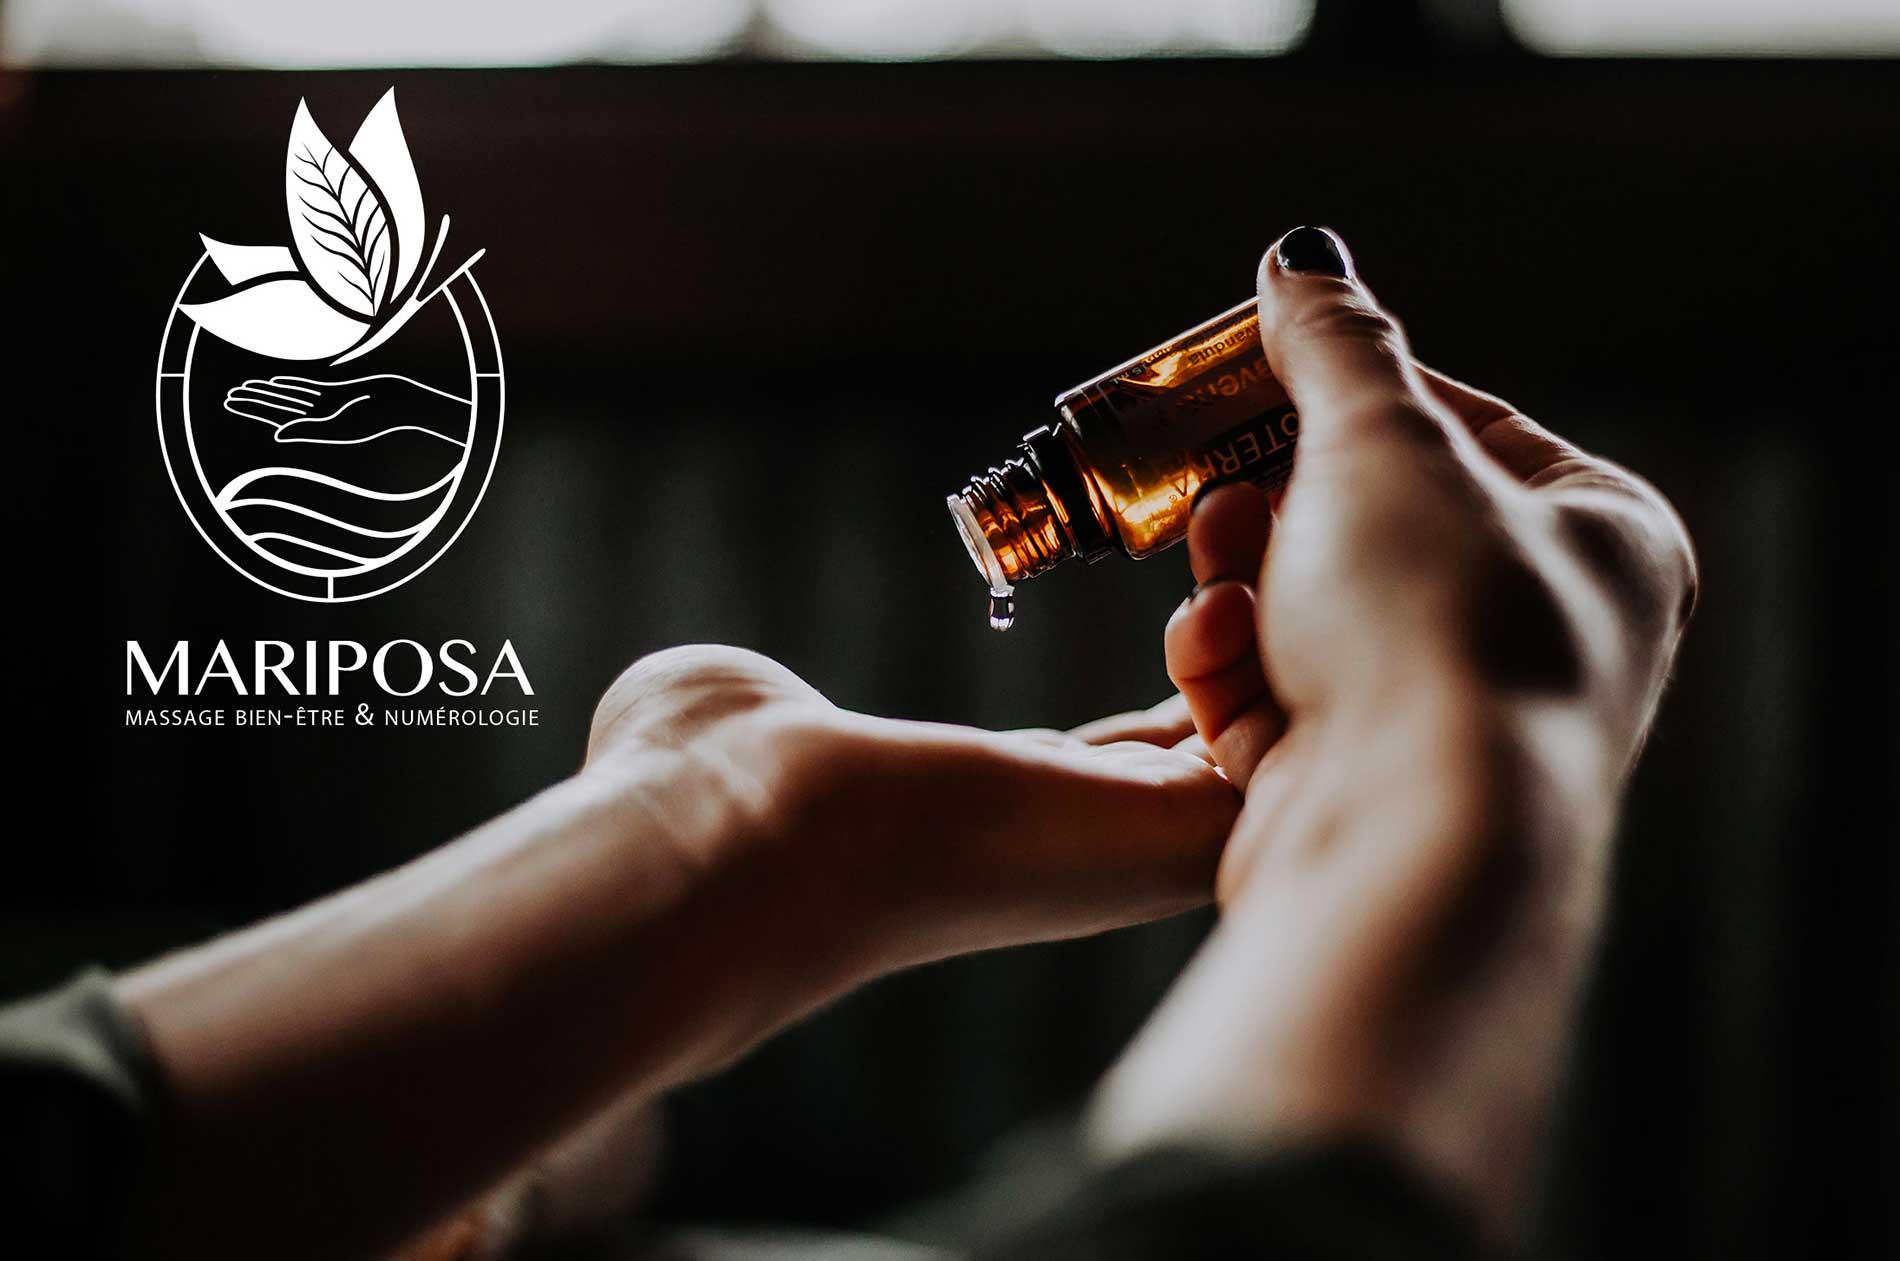 mains-huilesessentielles-mariposa-capbreton-bienetre-numerologie-massage-skoncommunication-mains-huilesessentielles